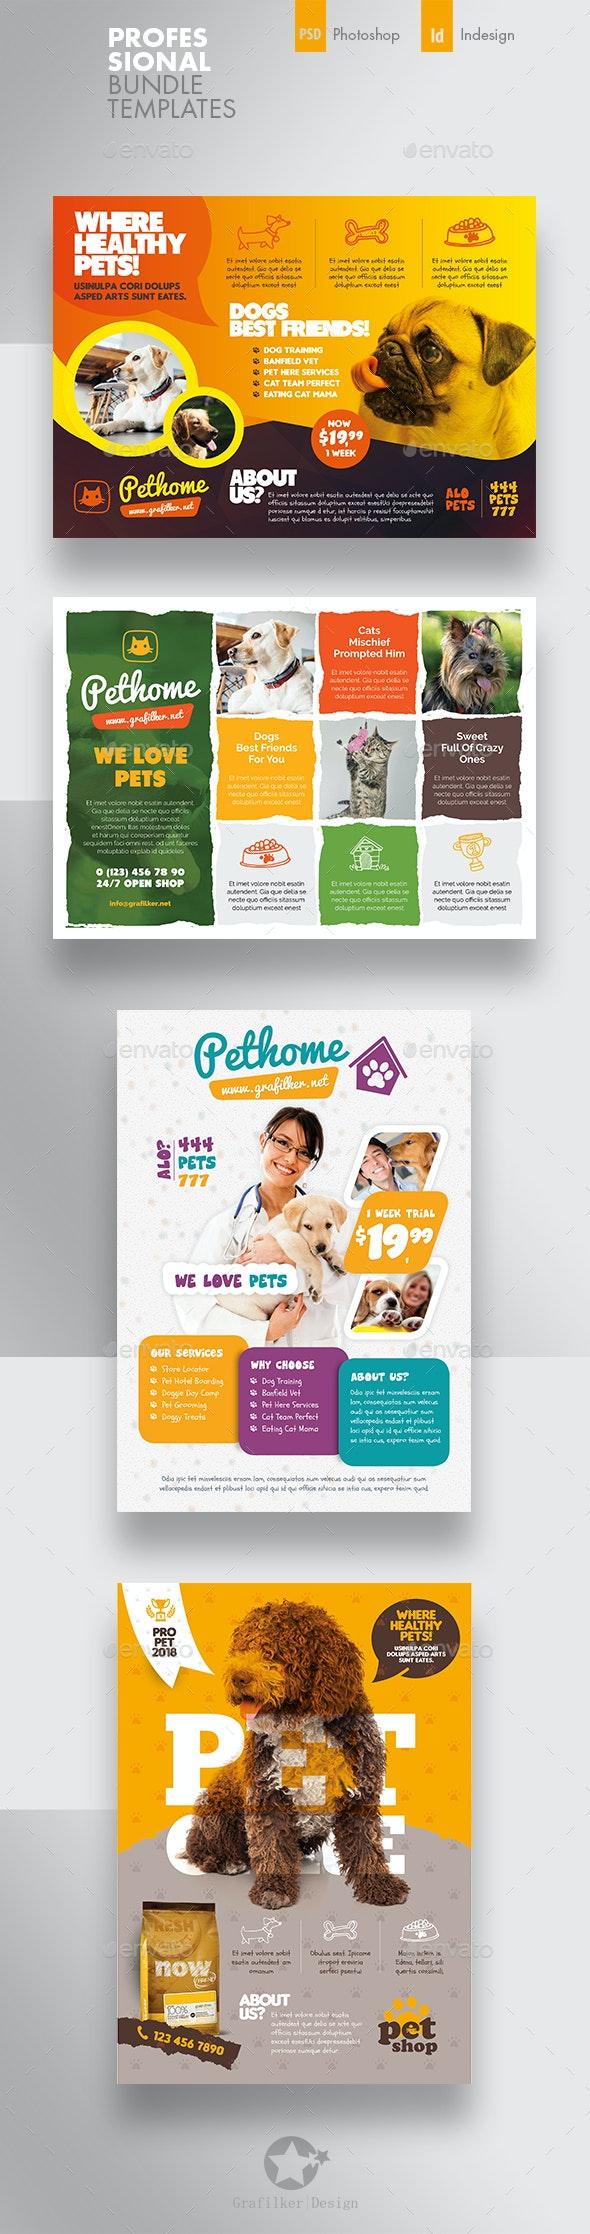 Petshop Flyer Bundle Templates - Corporate Flyers